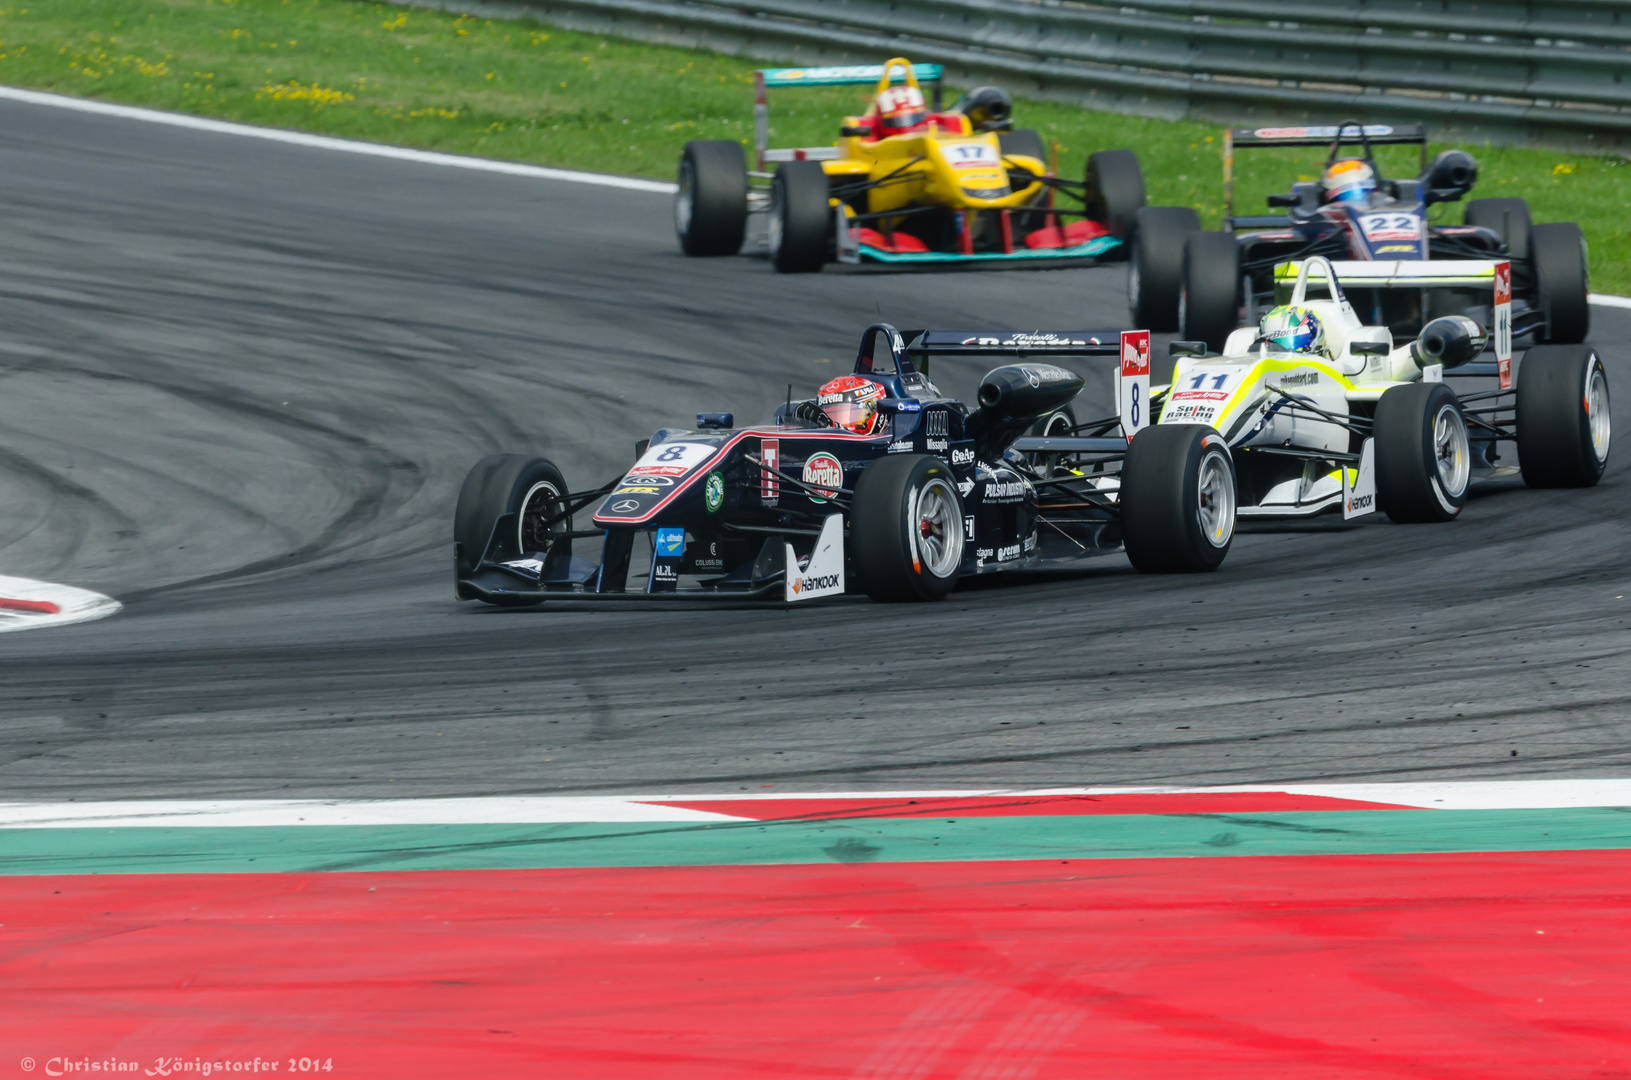 Formel 3 - Spielberg 2014